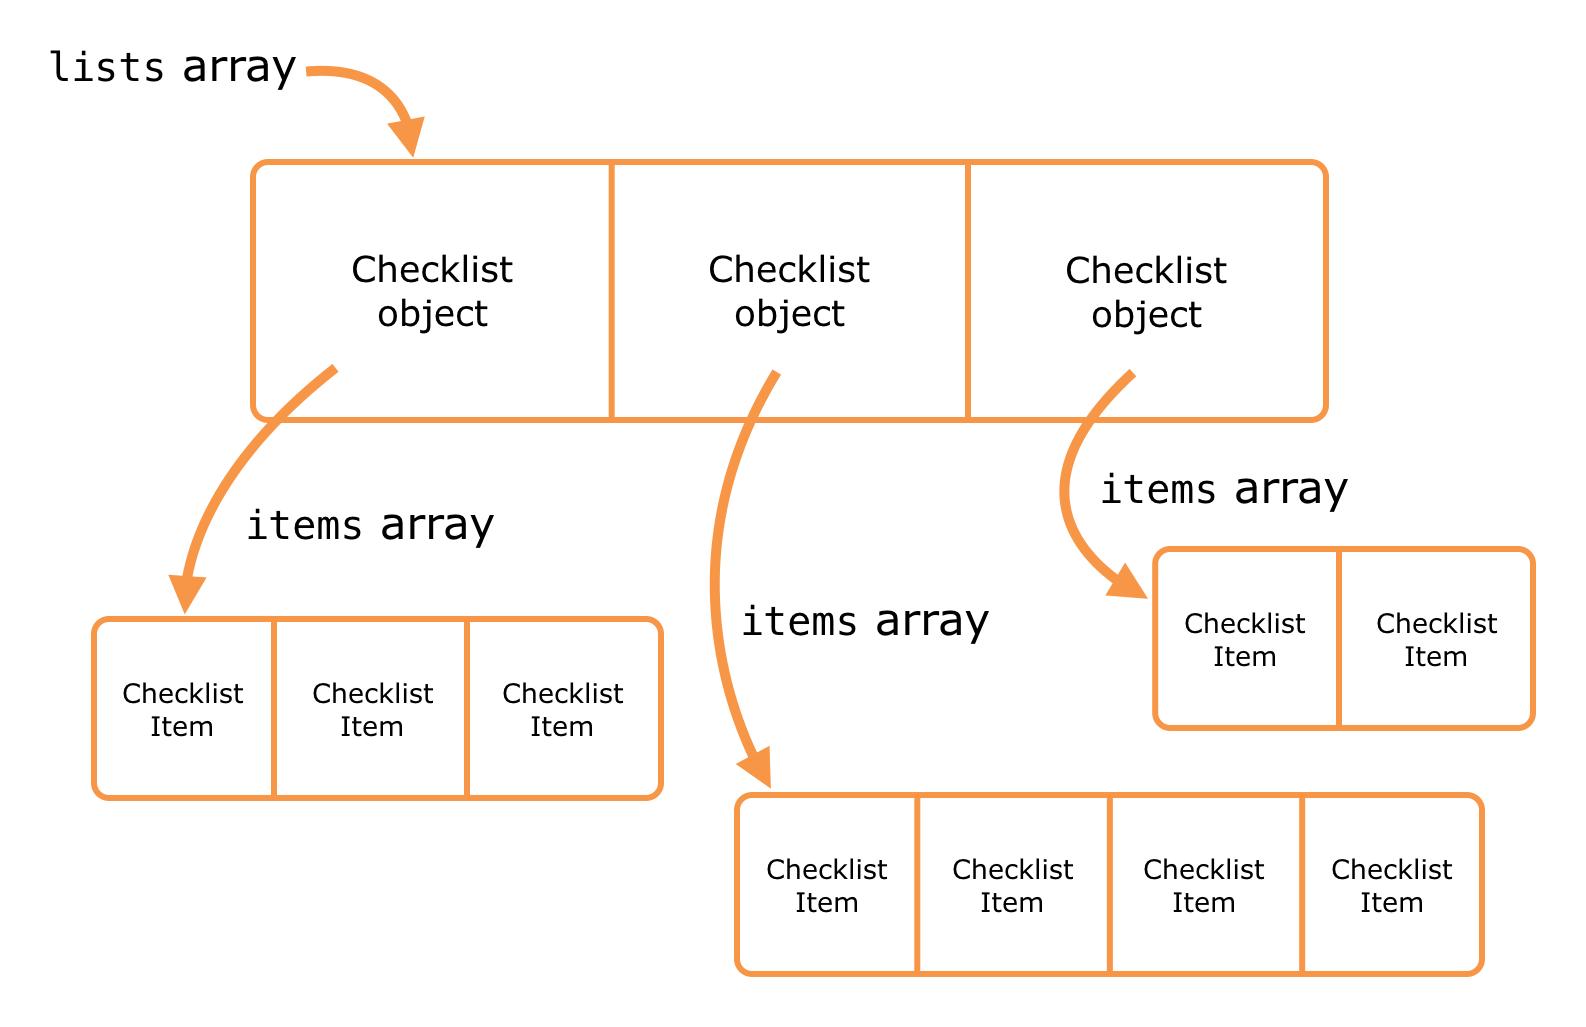 Each Checklist object has an array of ChecklistItem objects